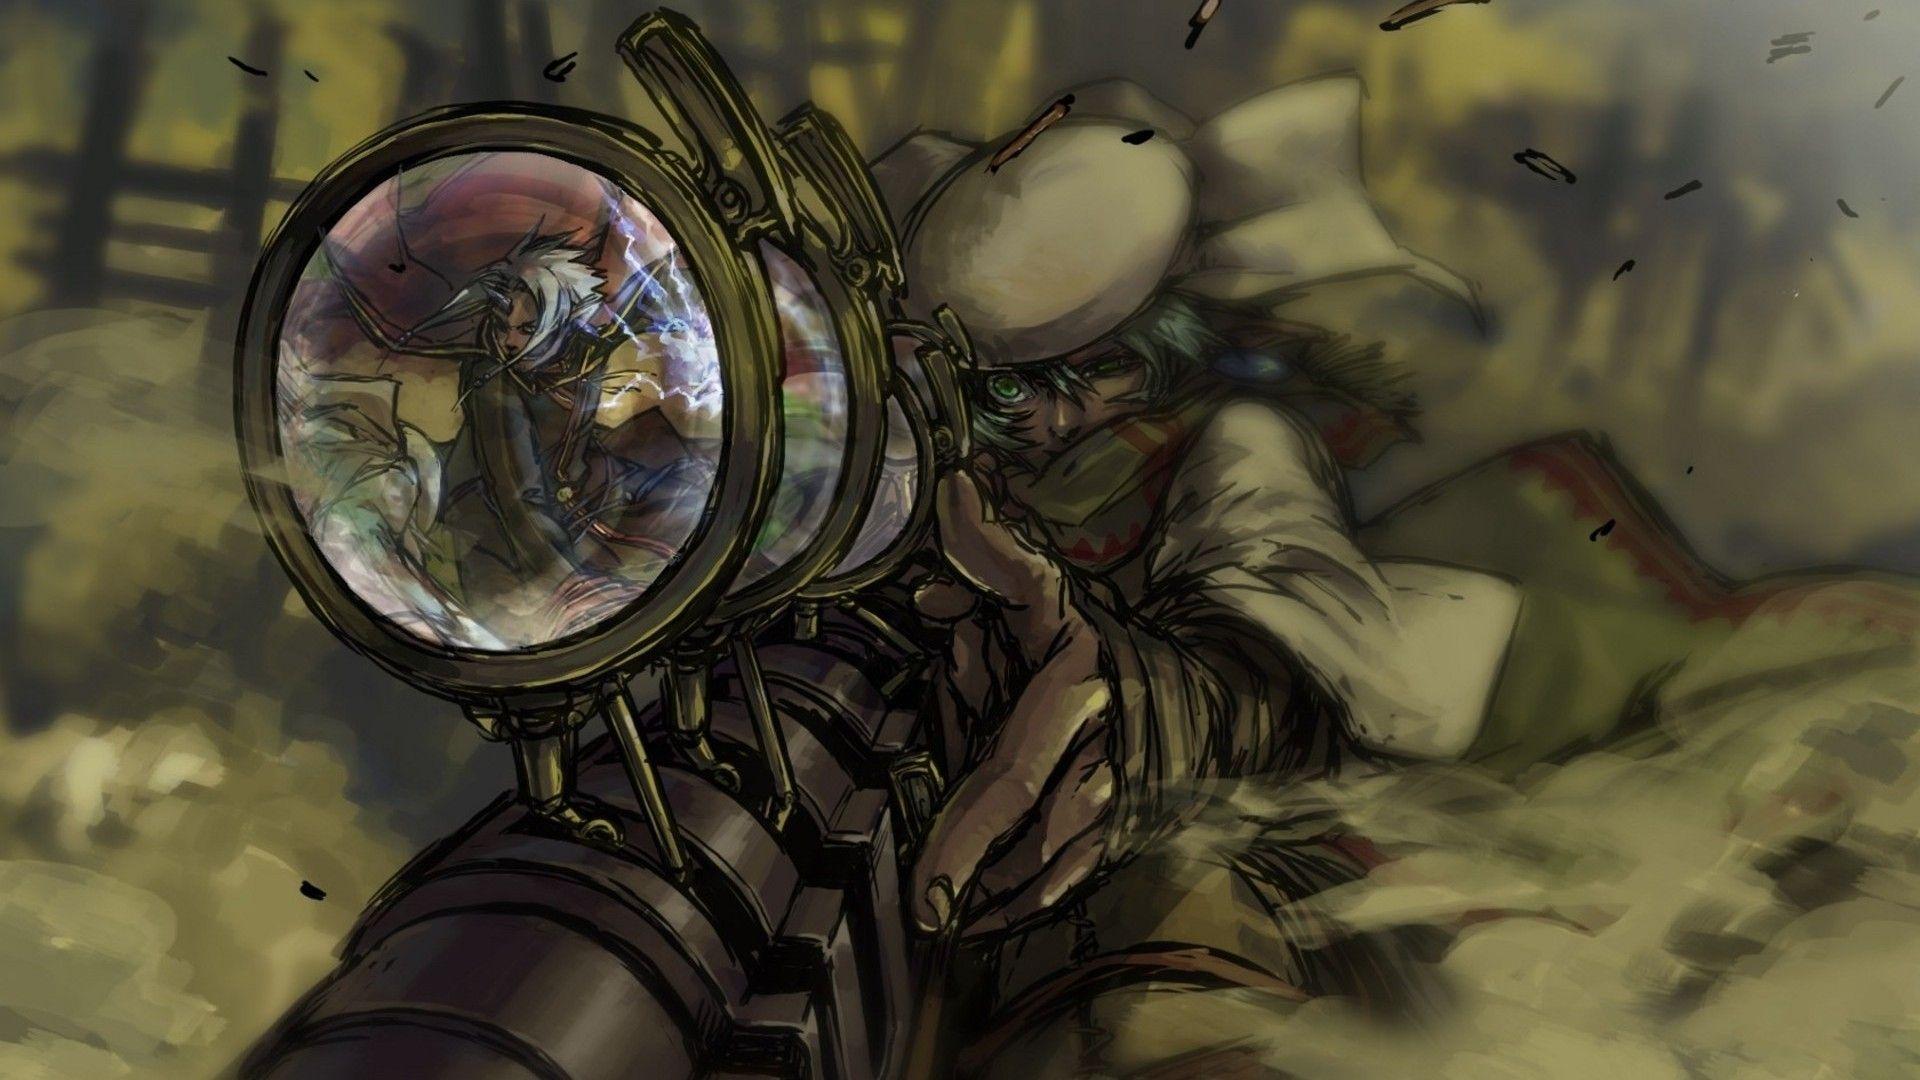 Fantastic Wallpaper Music Steampunk - steampunk-anime-wallpaper-1  Trends_827698.jpg